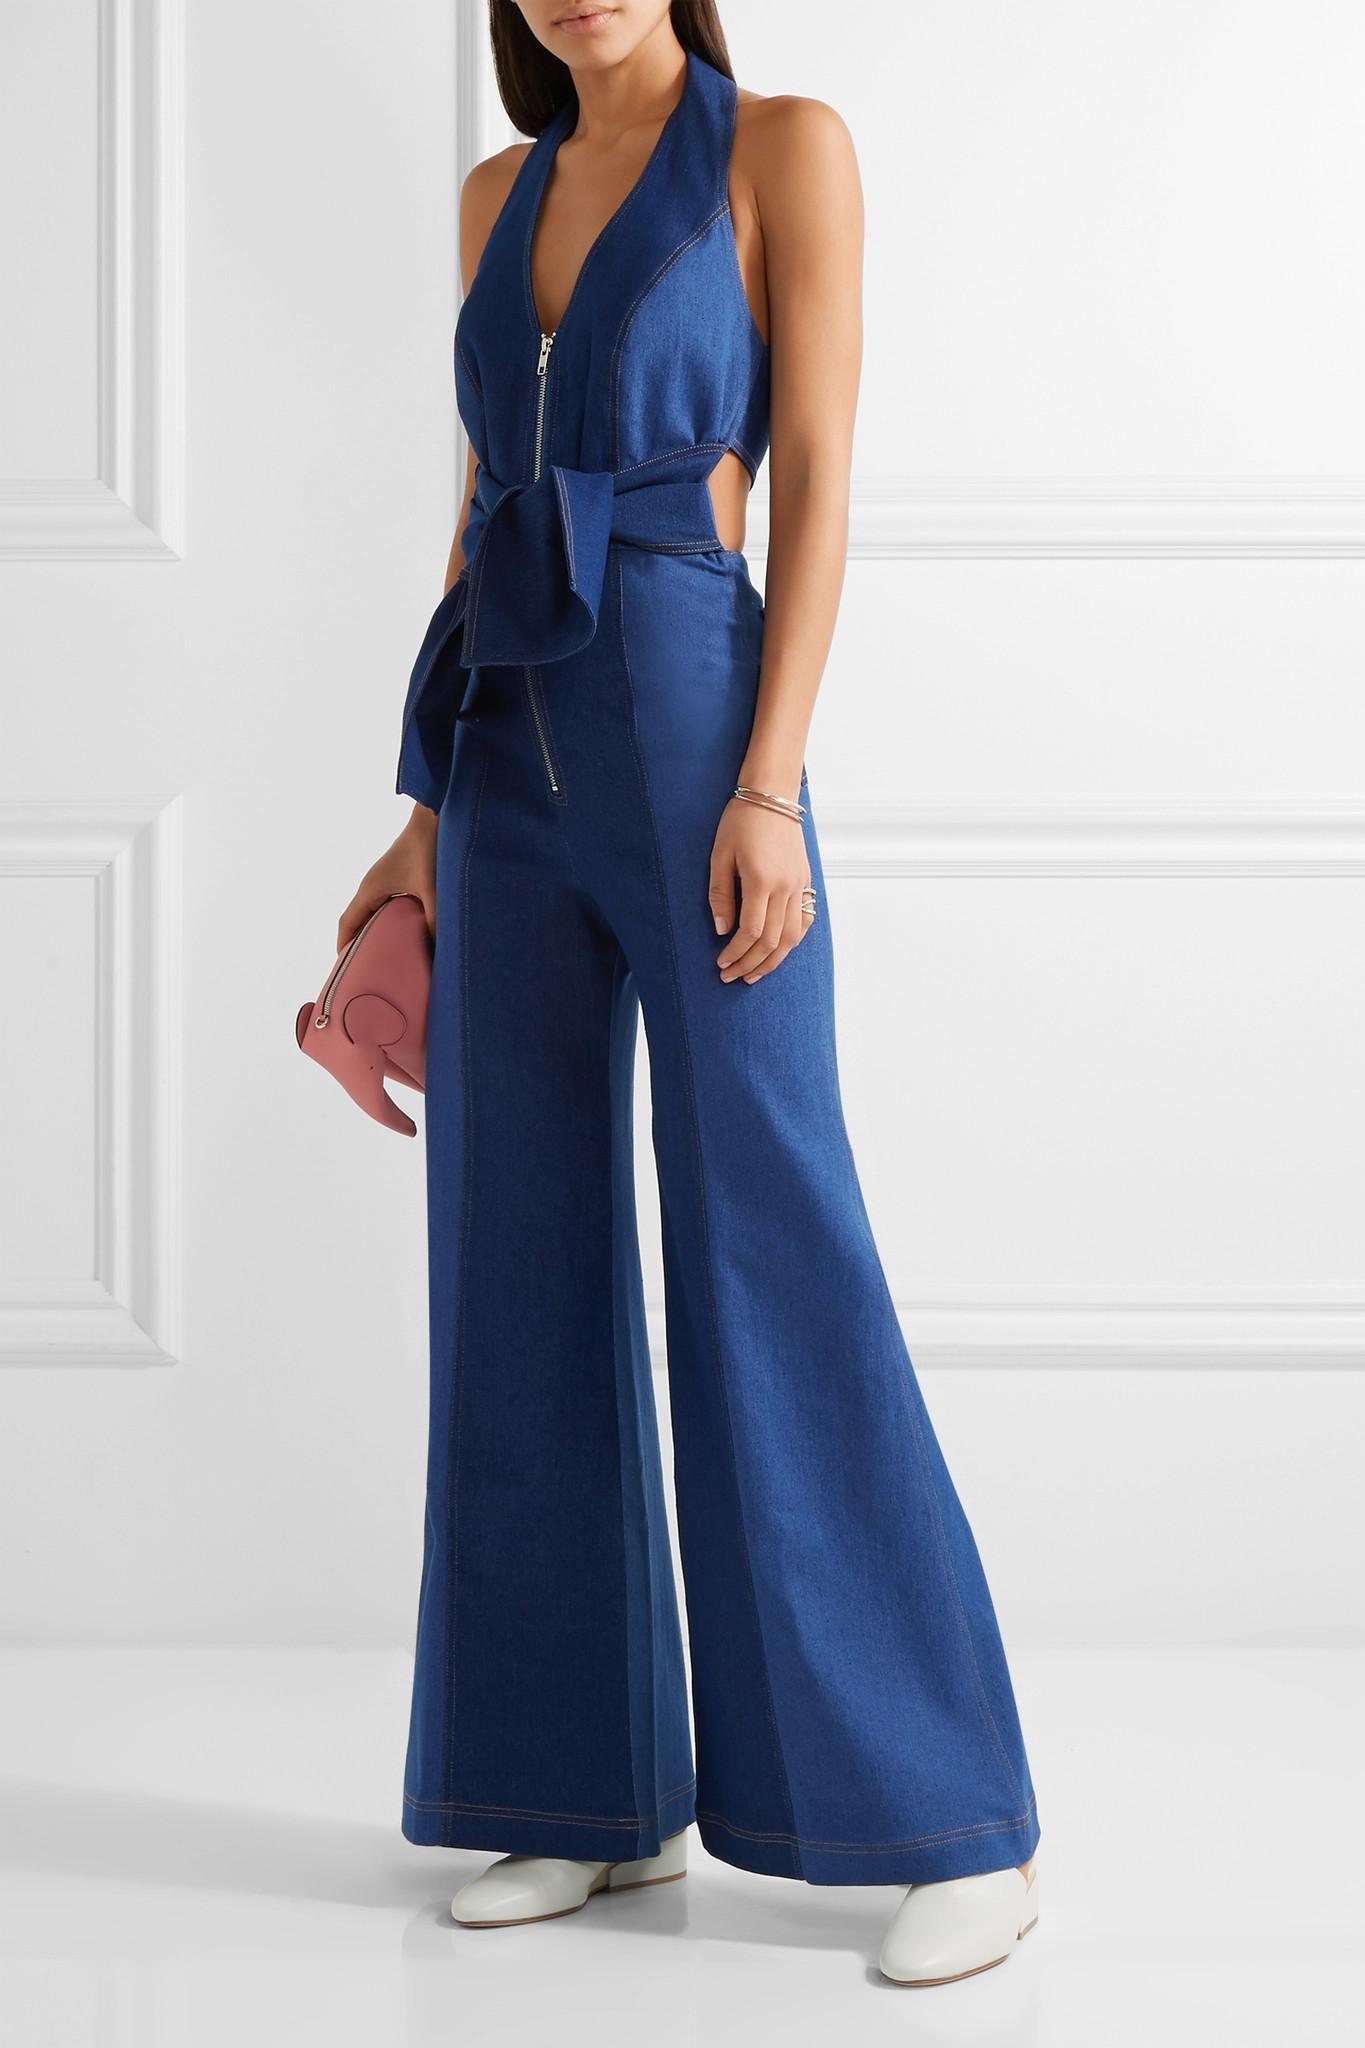 1a7ce5bfb98c Lyst - Paper London Soleil Two-tone Denim Halterneck Jumpsuit in Blue